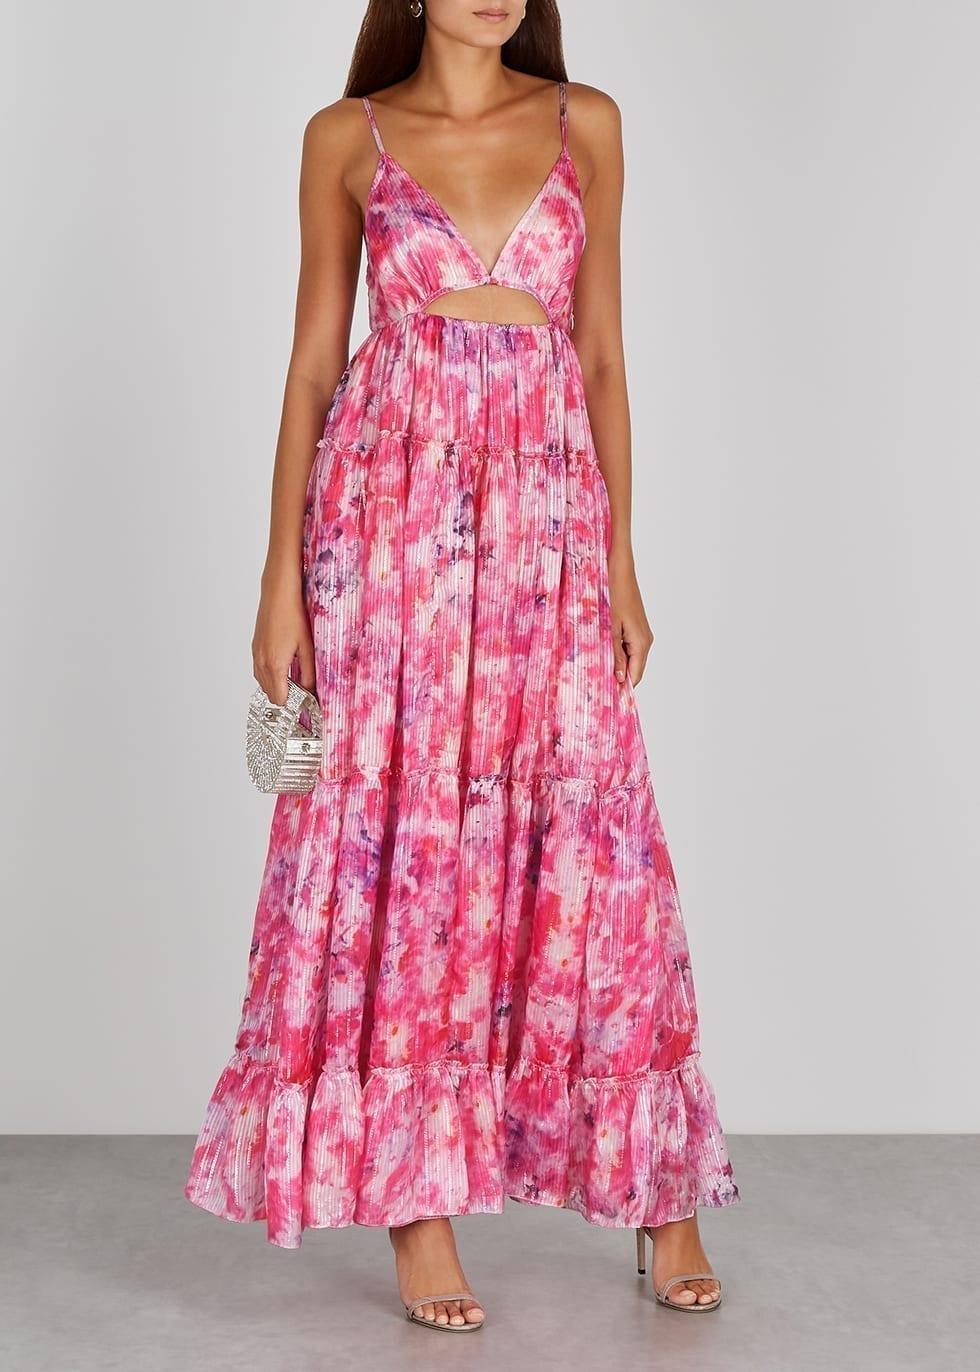 ROCOCO SAND Hikari Pink Lamé-weave Satin Maxi Dress